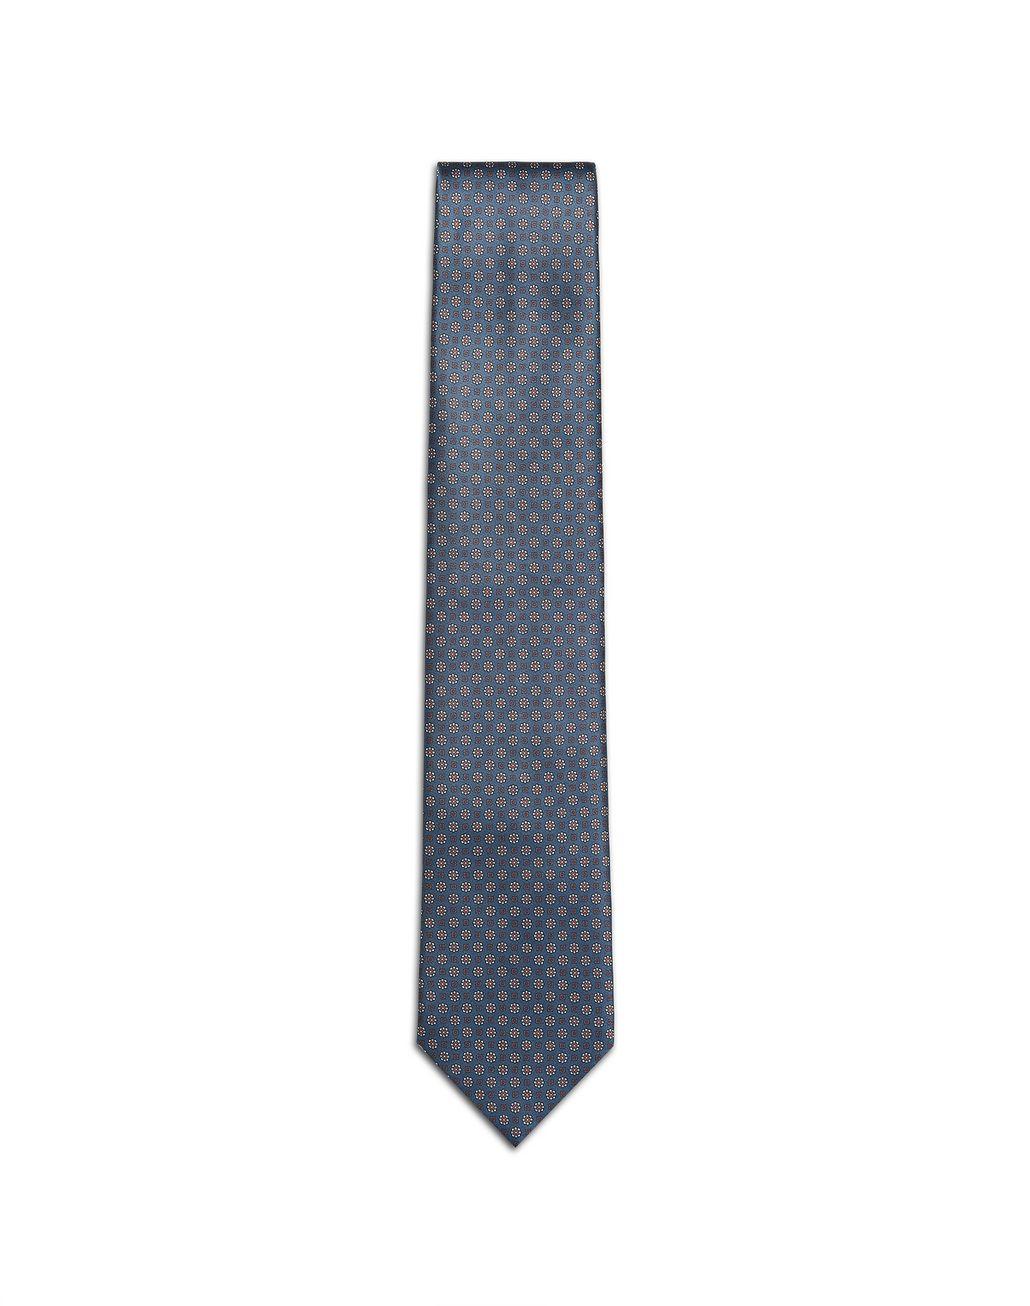 BRIONI Blaue Krawatte mit Micro-Muster Krawatte [*** pickupInStoreShippingNotGuaranteed_info ***] f